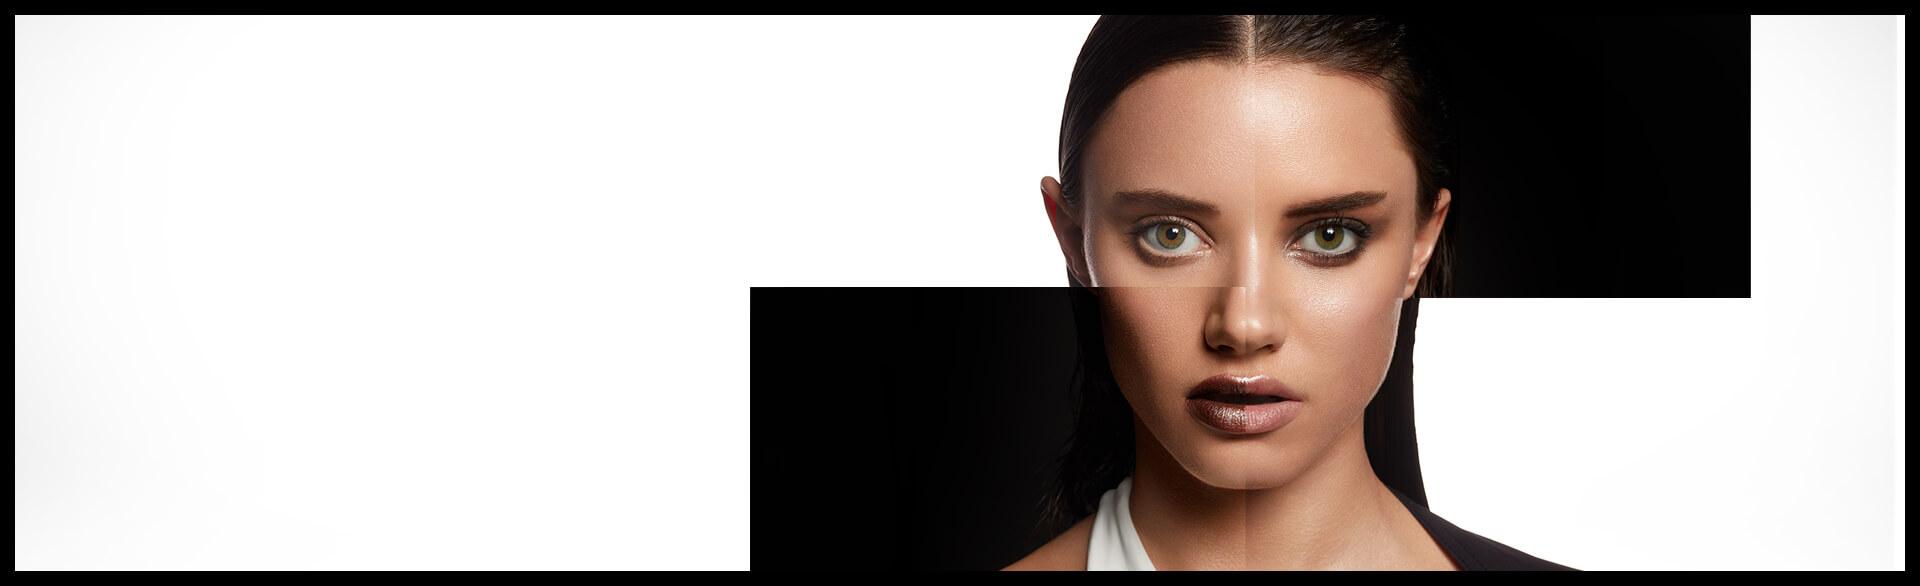 Illamasqua home page